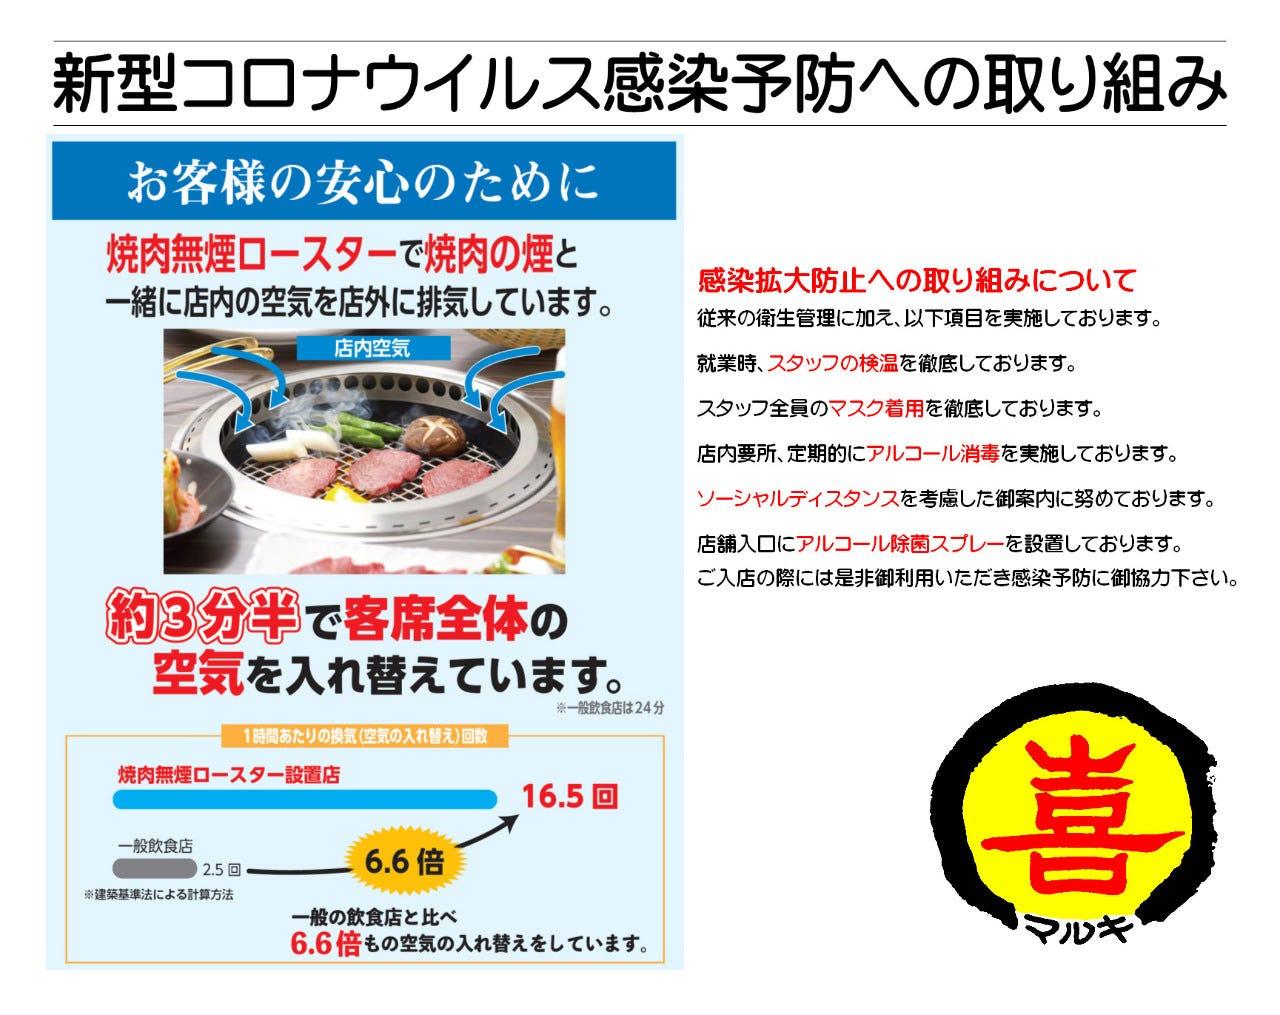 焼肉屋 マルキ市場NEXT 町田店